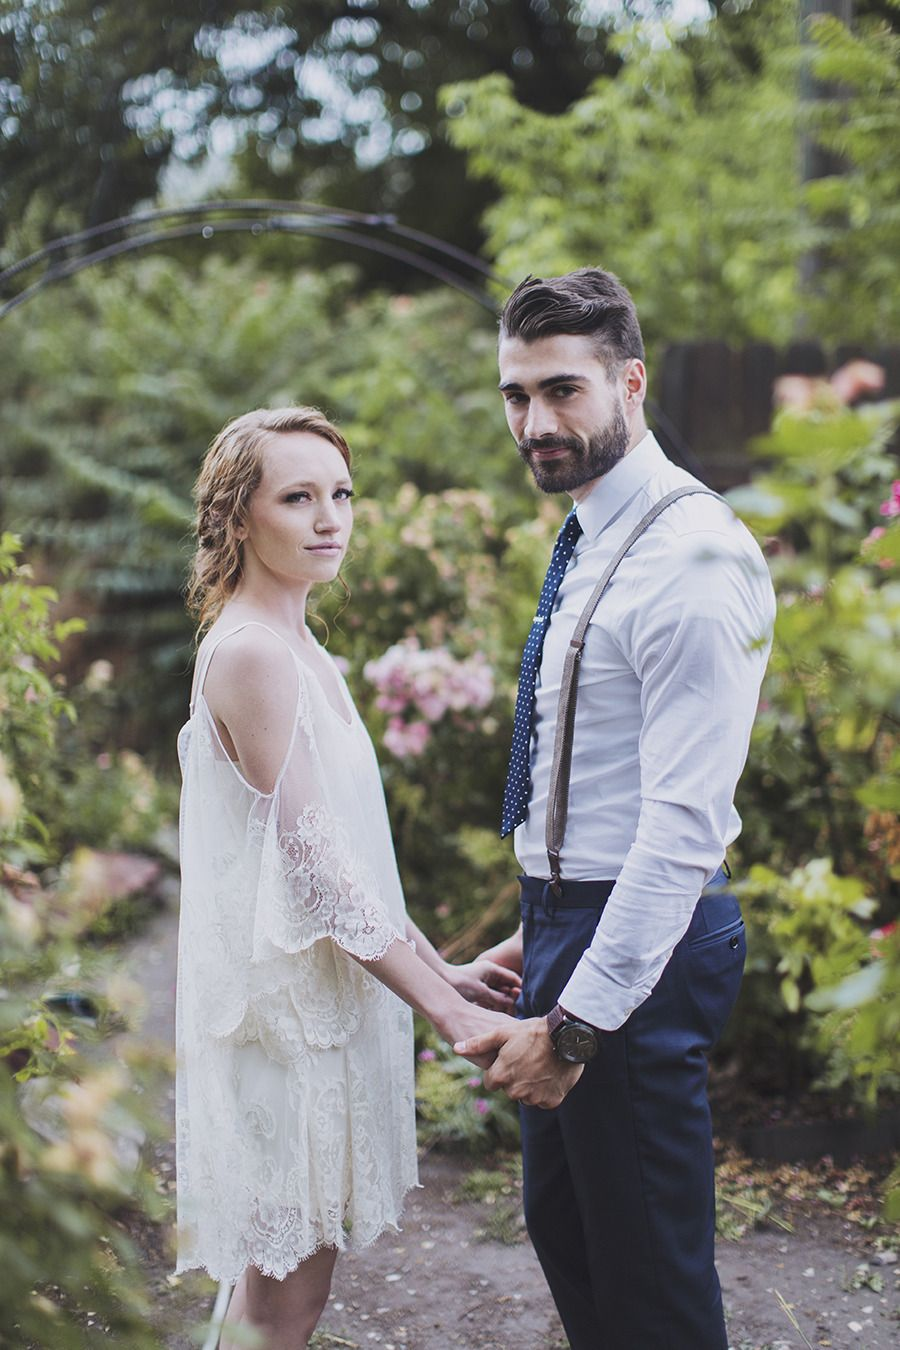 The Ultimate Bearded Groomsmen Guide | Groomsmen outfits, Wedding ...